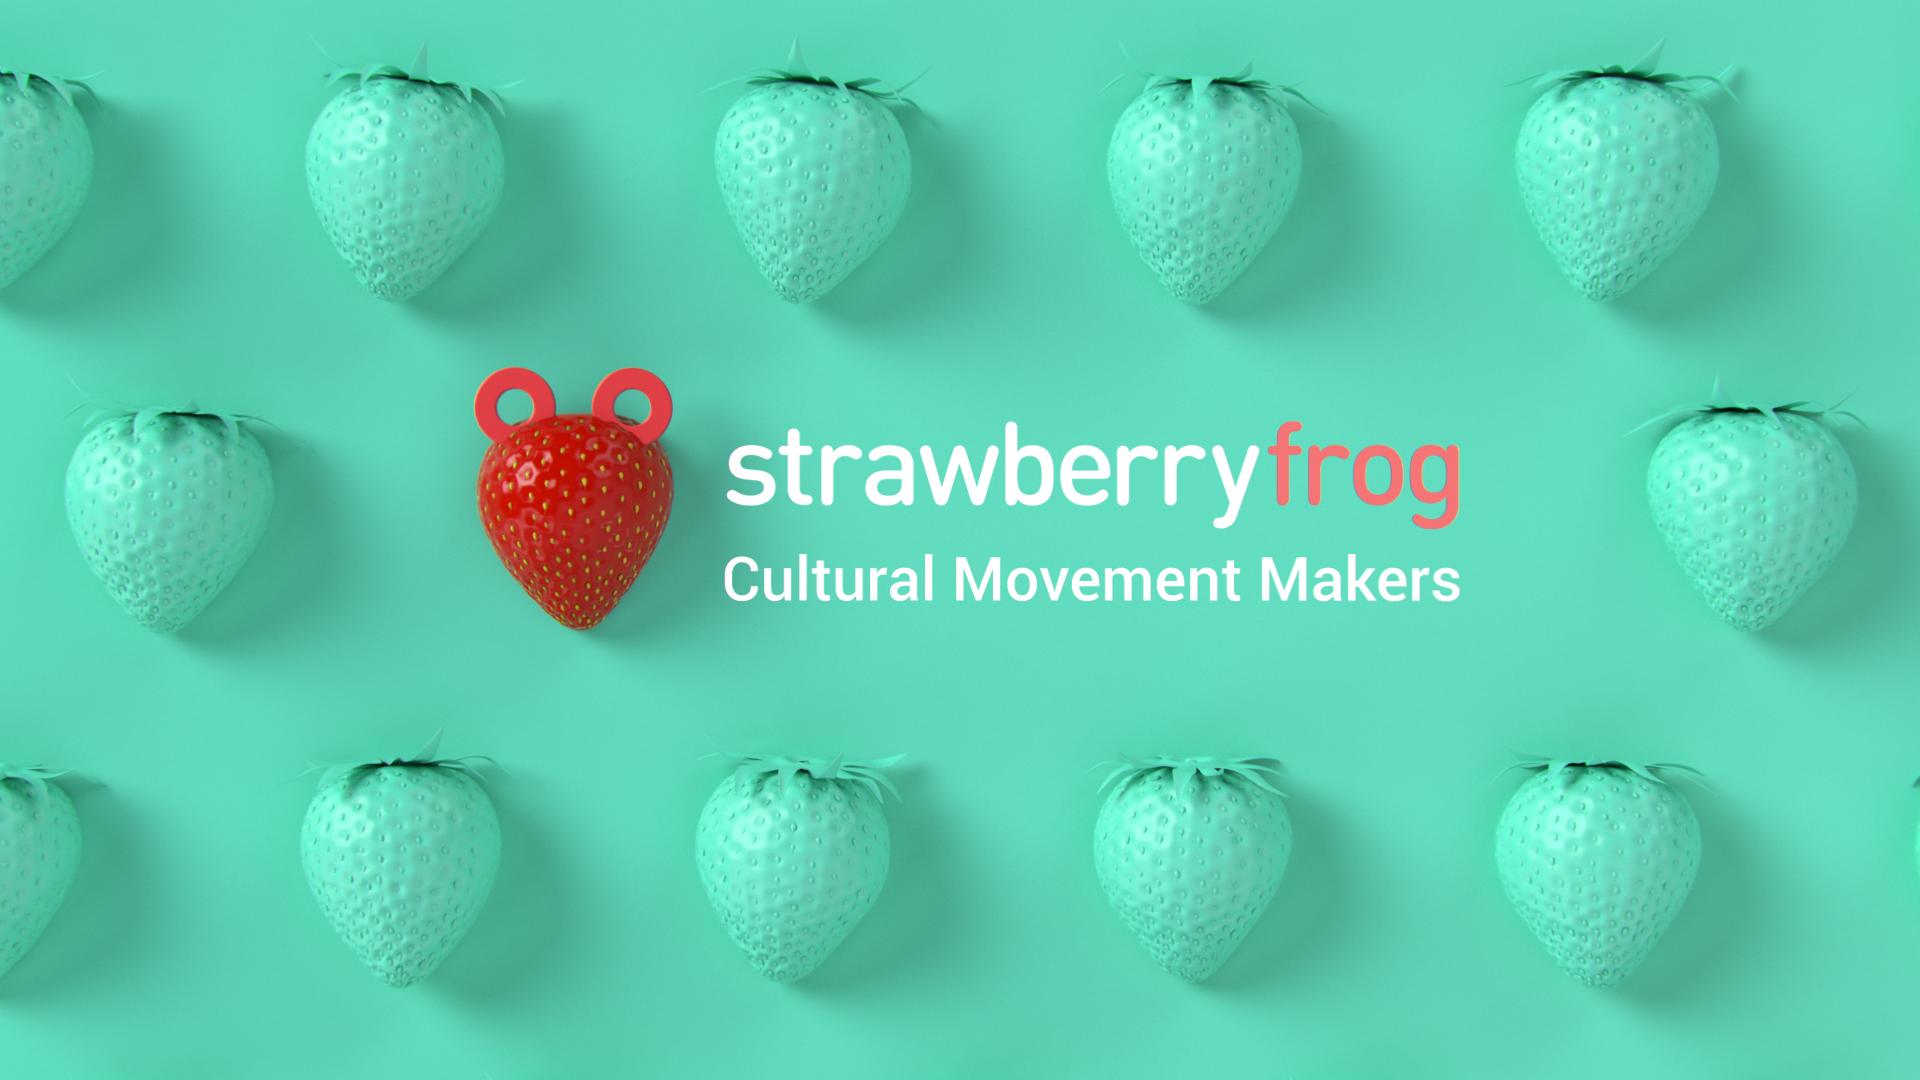 StrawberryFrog_Conform_0622_1440.jpg